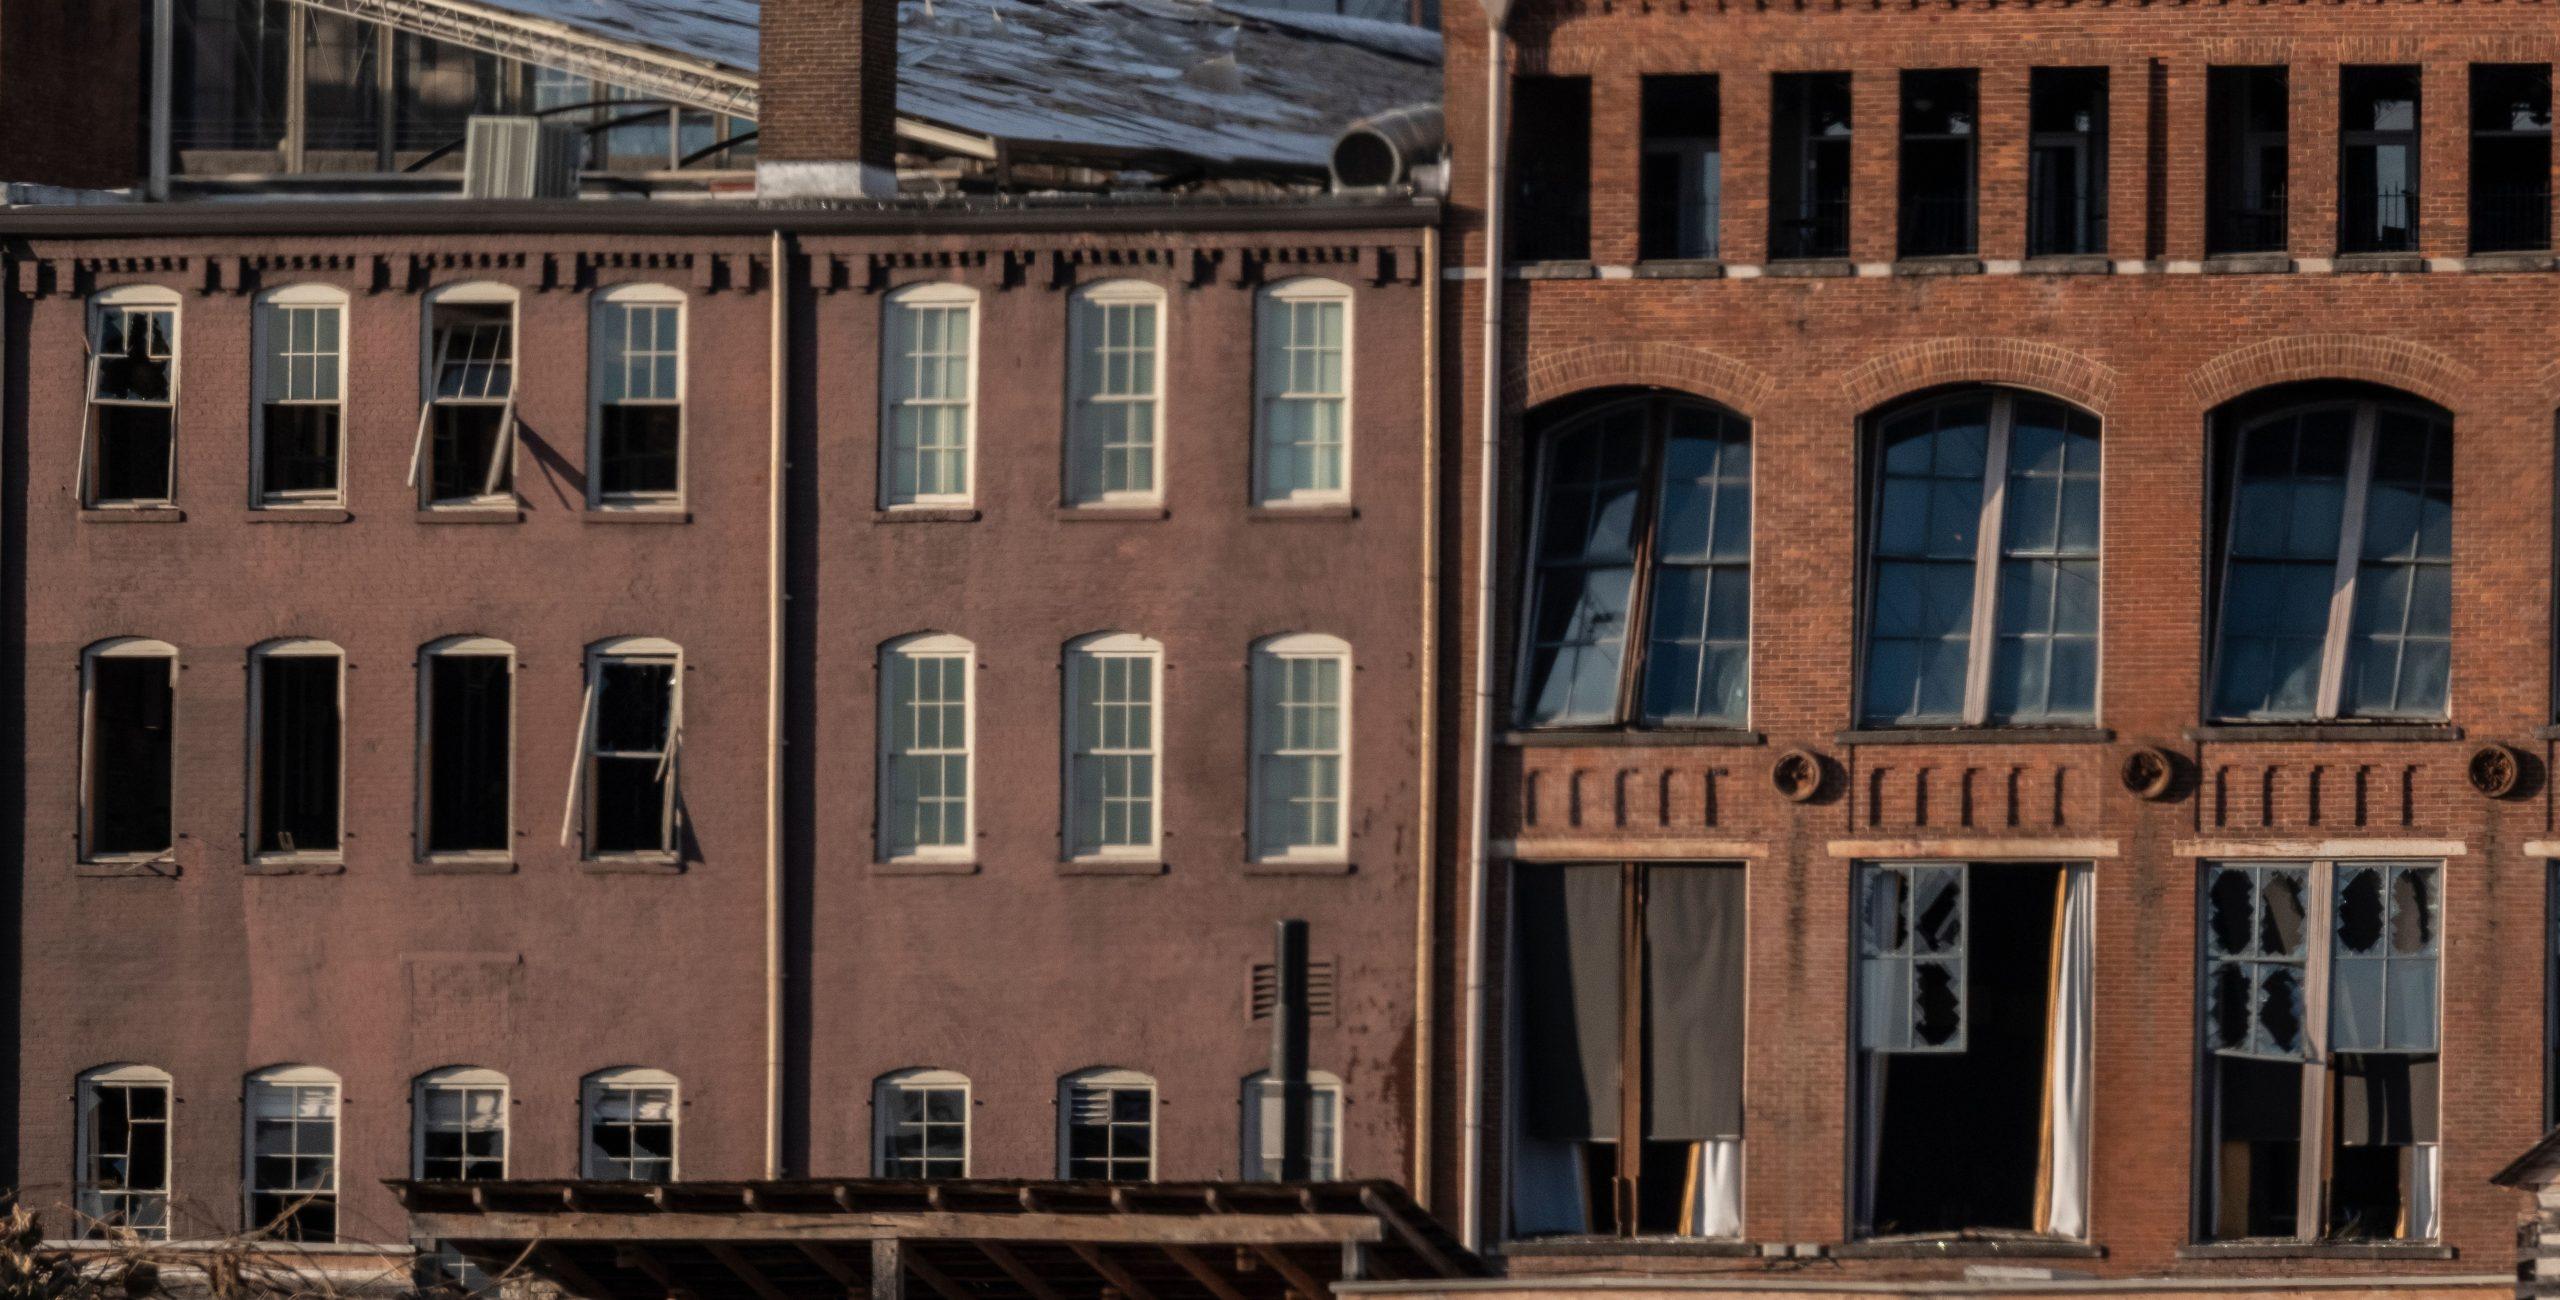 Second Avenue bomb site center of Nashville's historic preservation movement